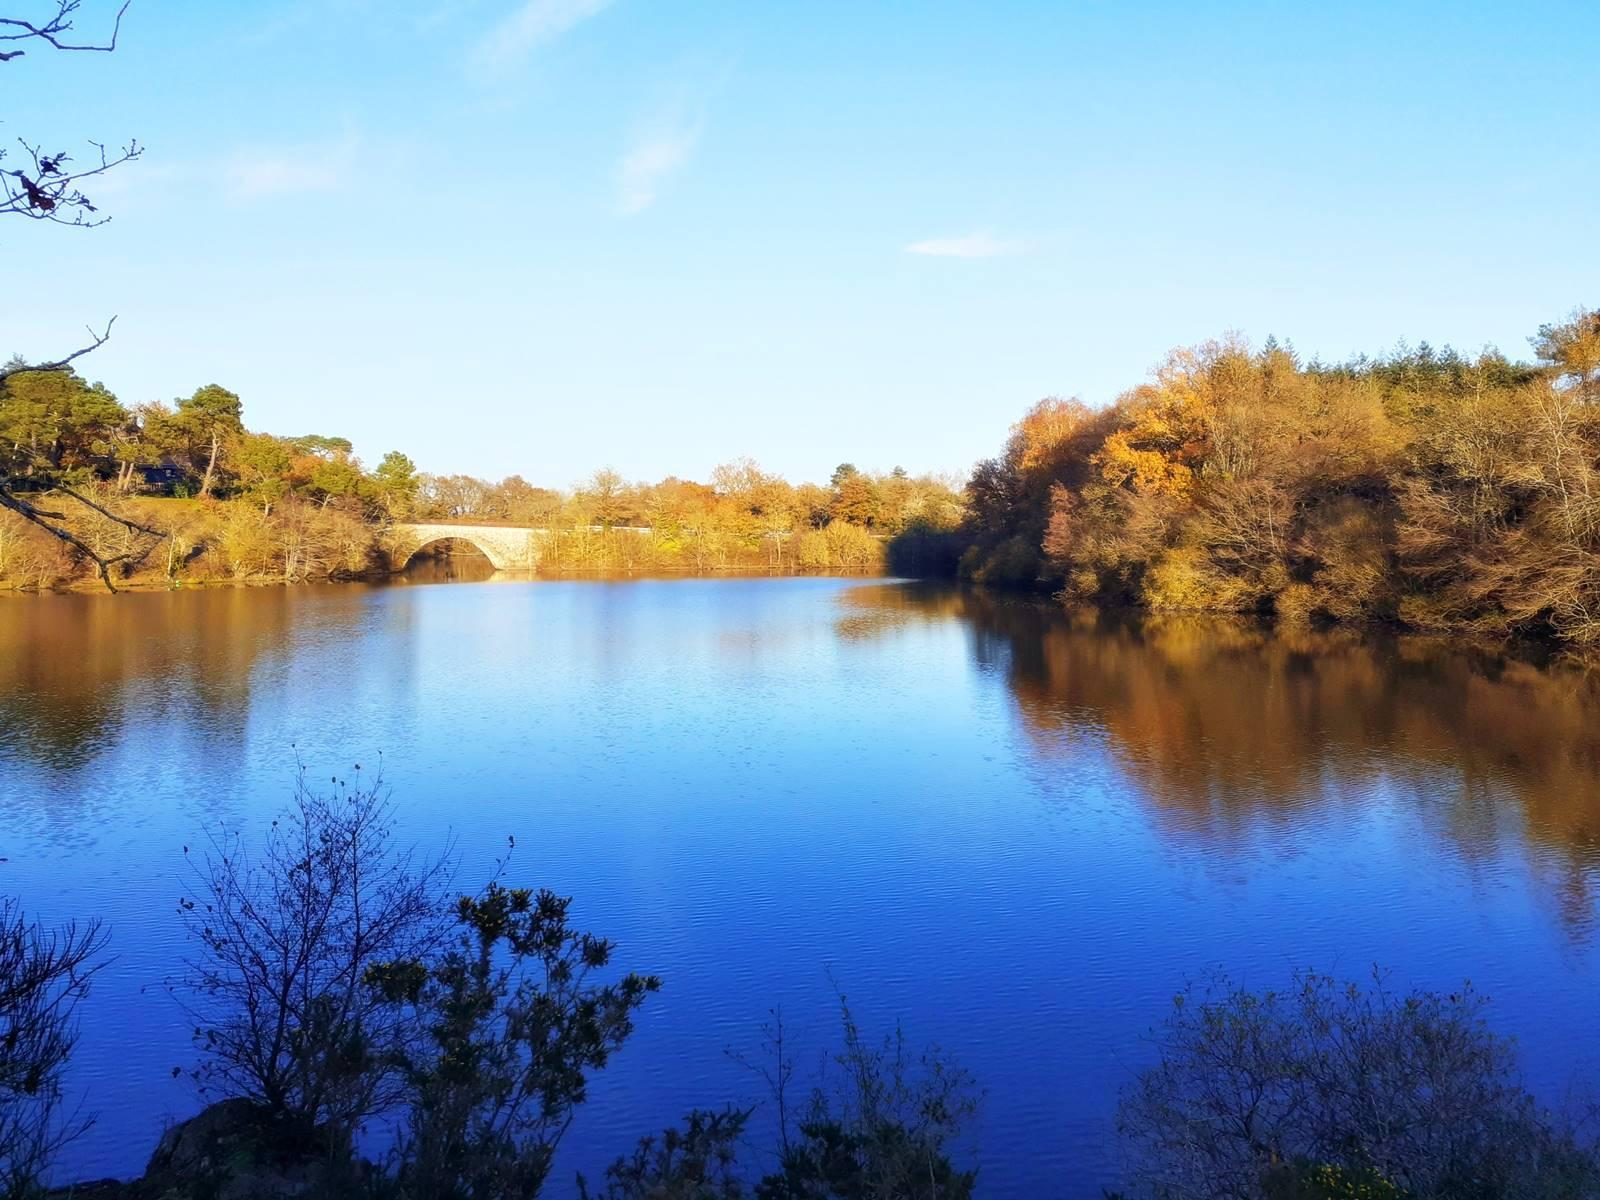 Moisdon la riviere faible20201128 172758